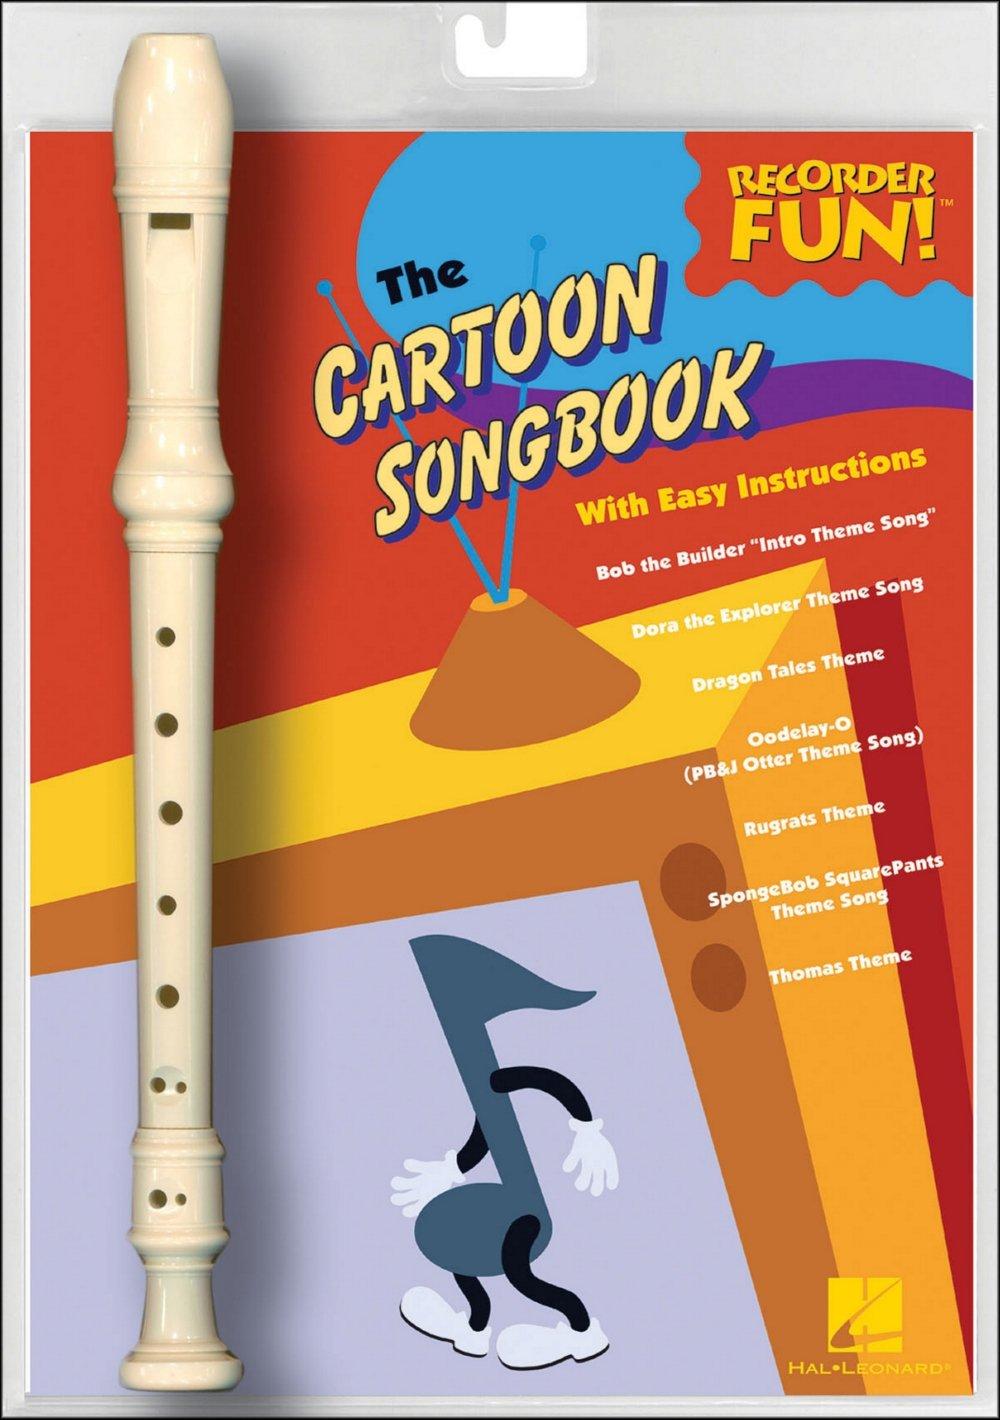 Amazon com: Hal Leonard The Cartoon Songbook - Recorder Fun